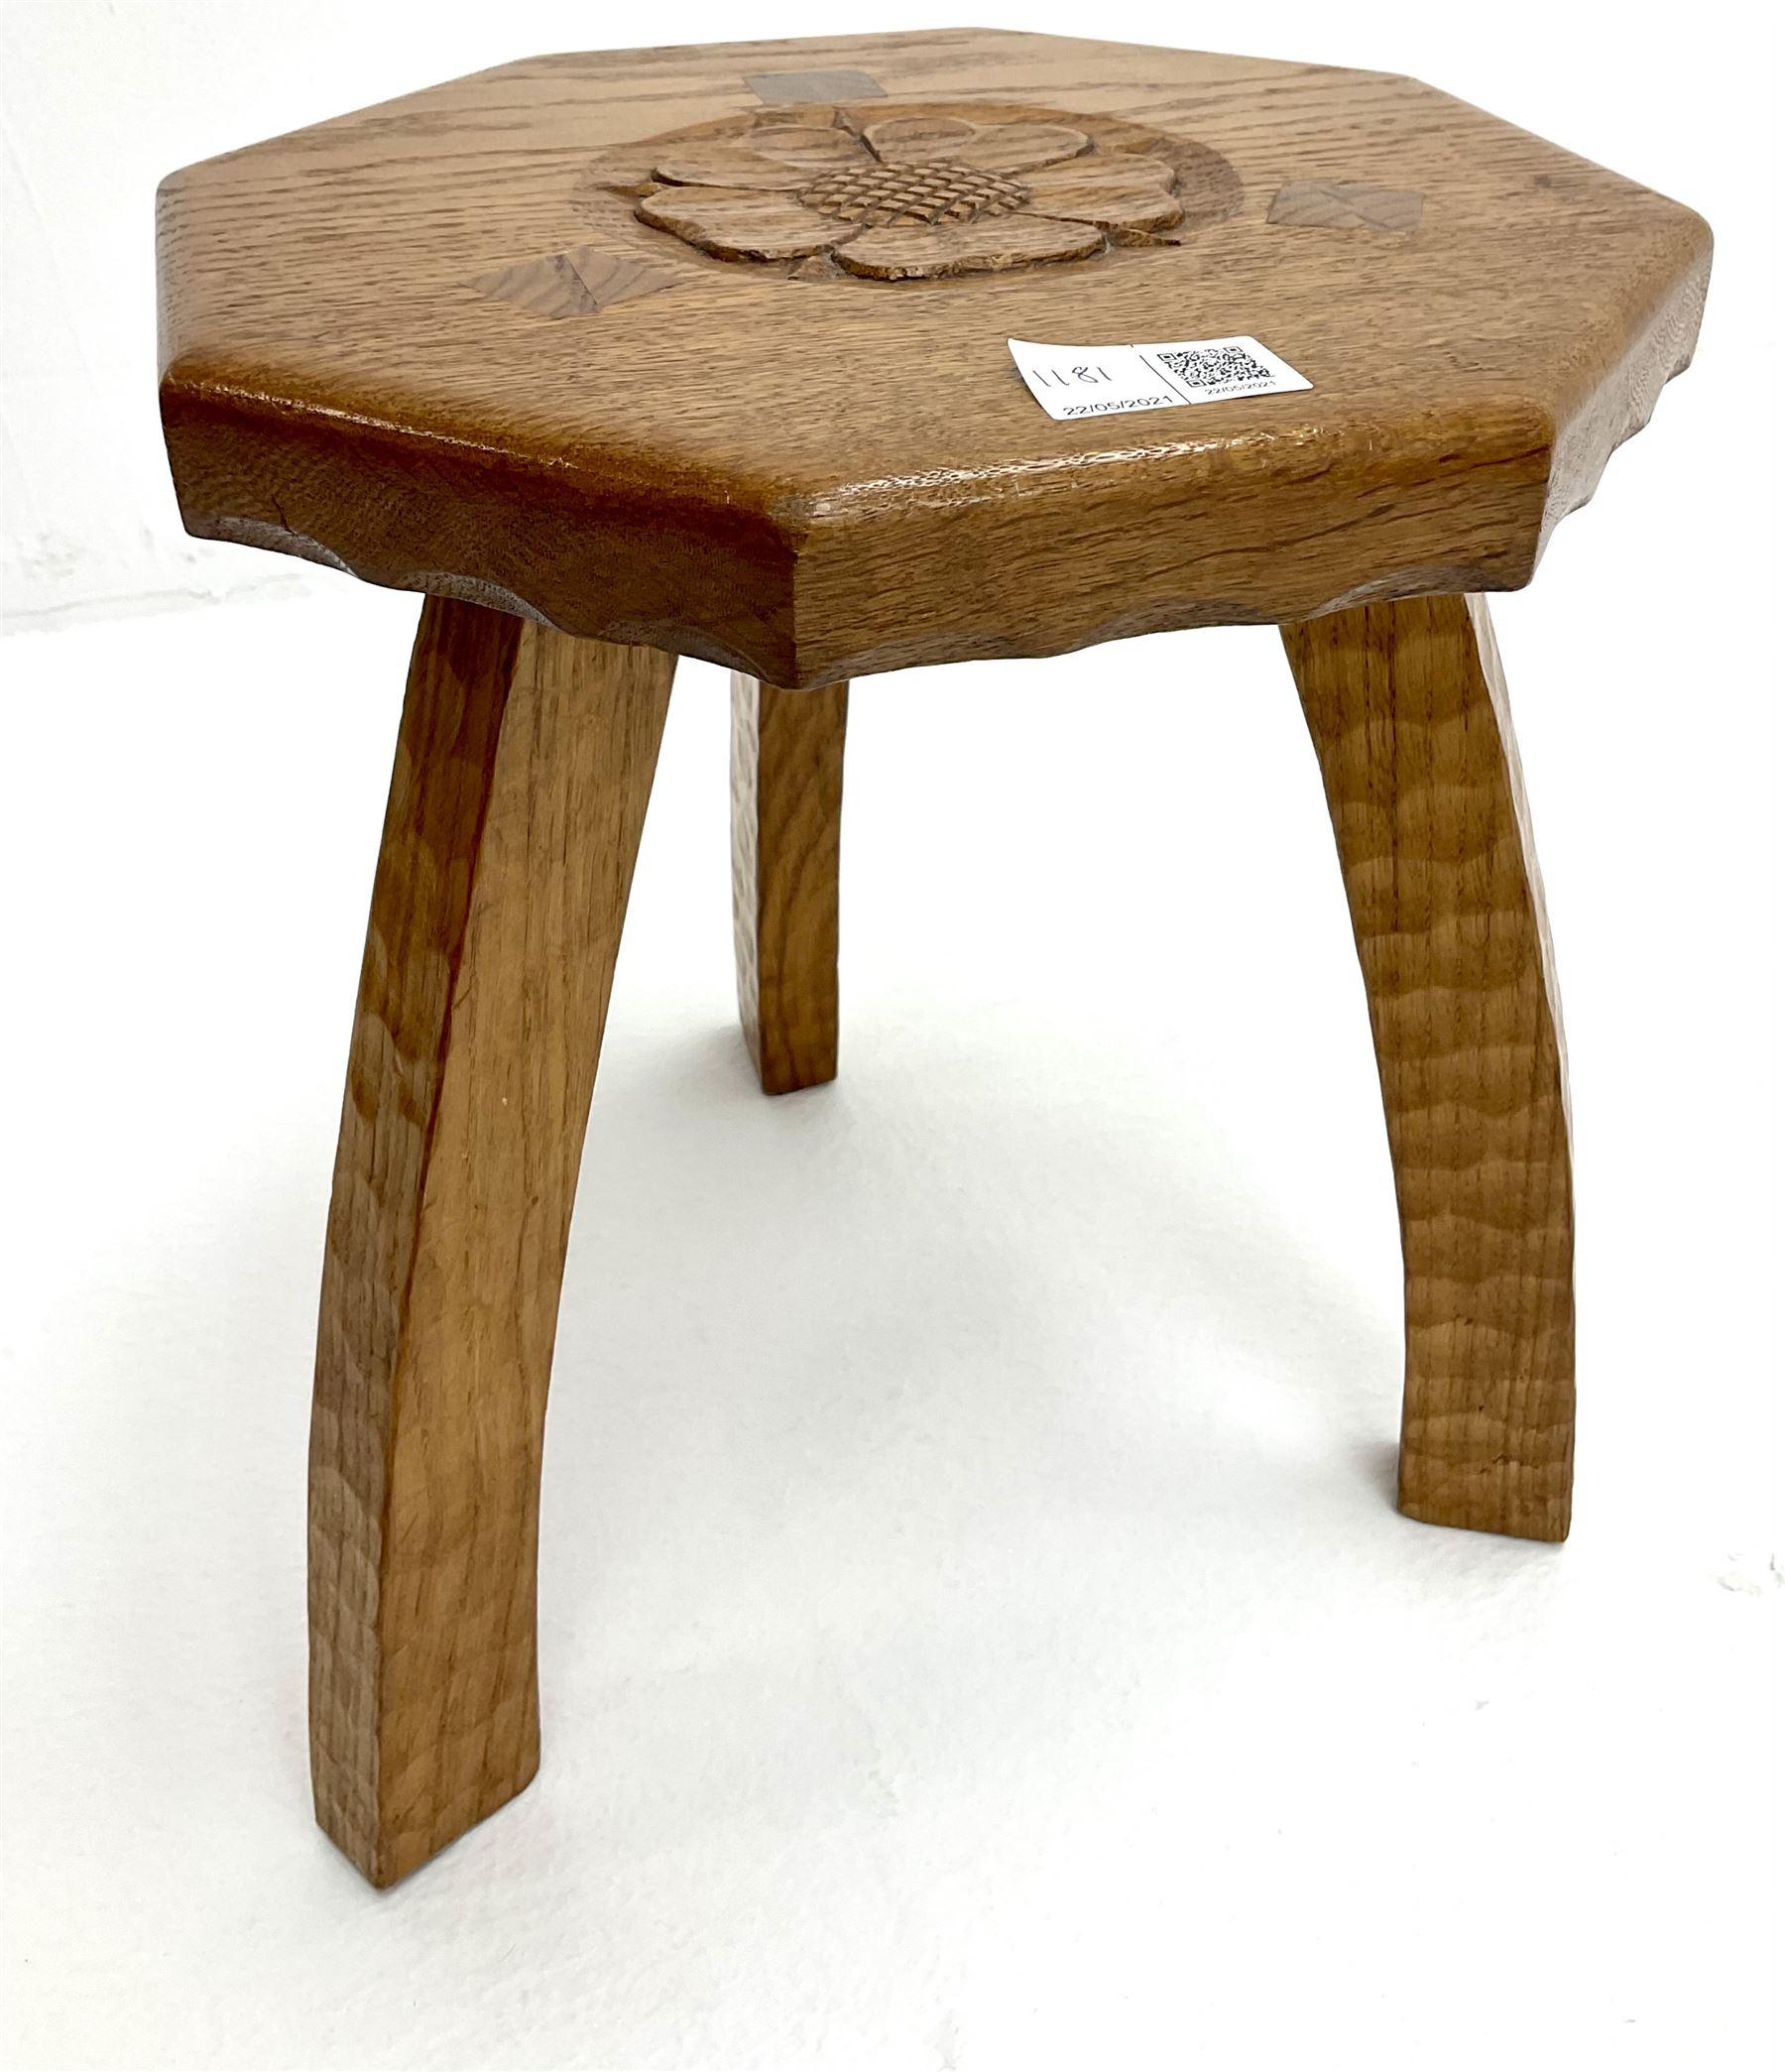 Yorkshire oak rectangular coffee table - Image 3 of 6